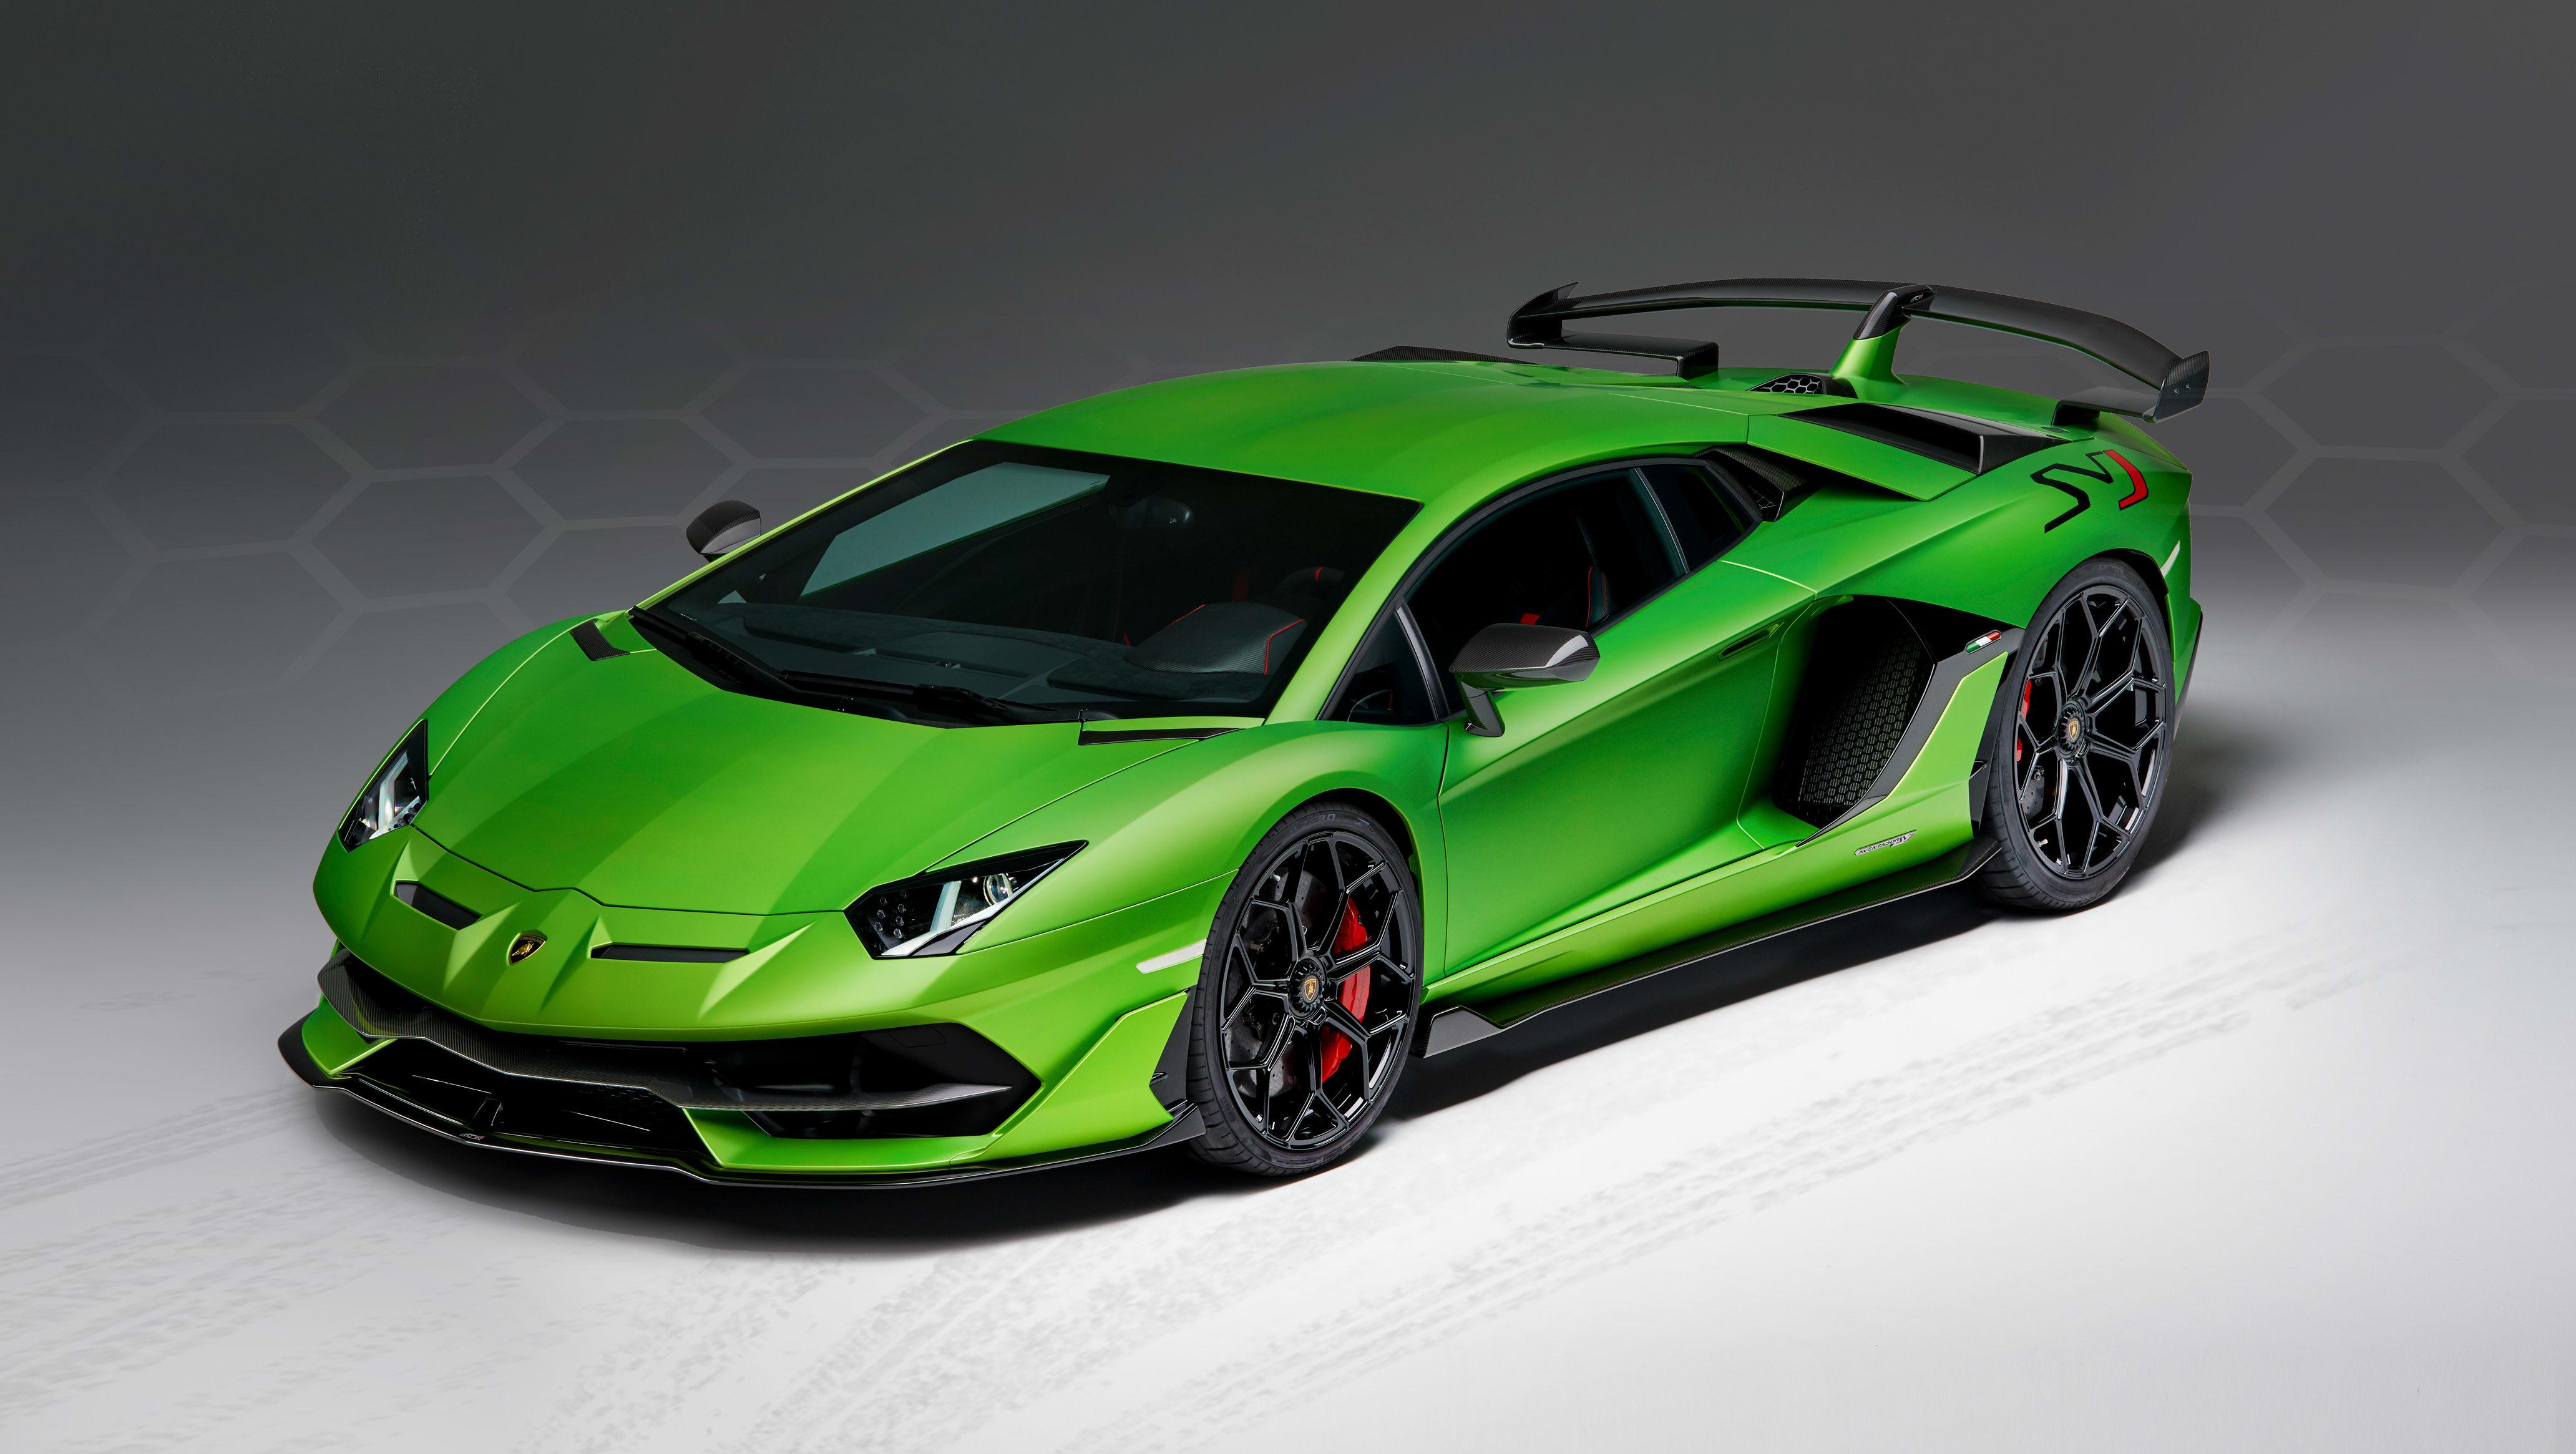 Lamborghini Aventador Svj 2019 Pricing And Spec Revealed Car News